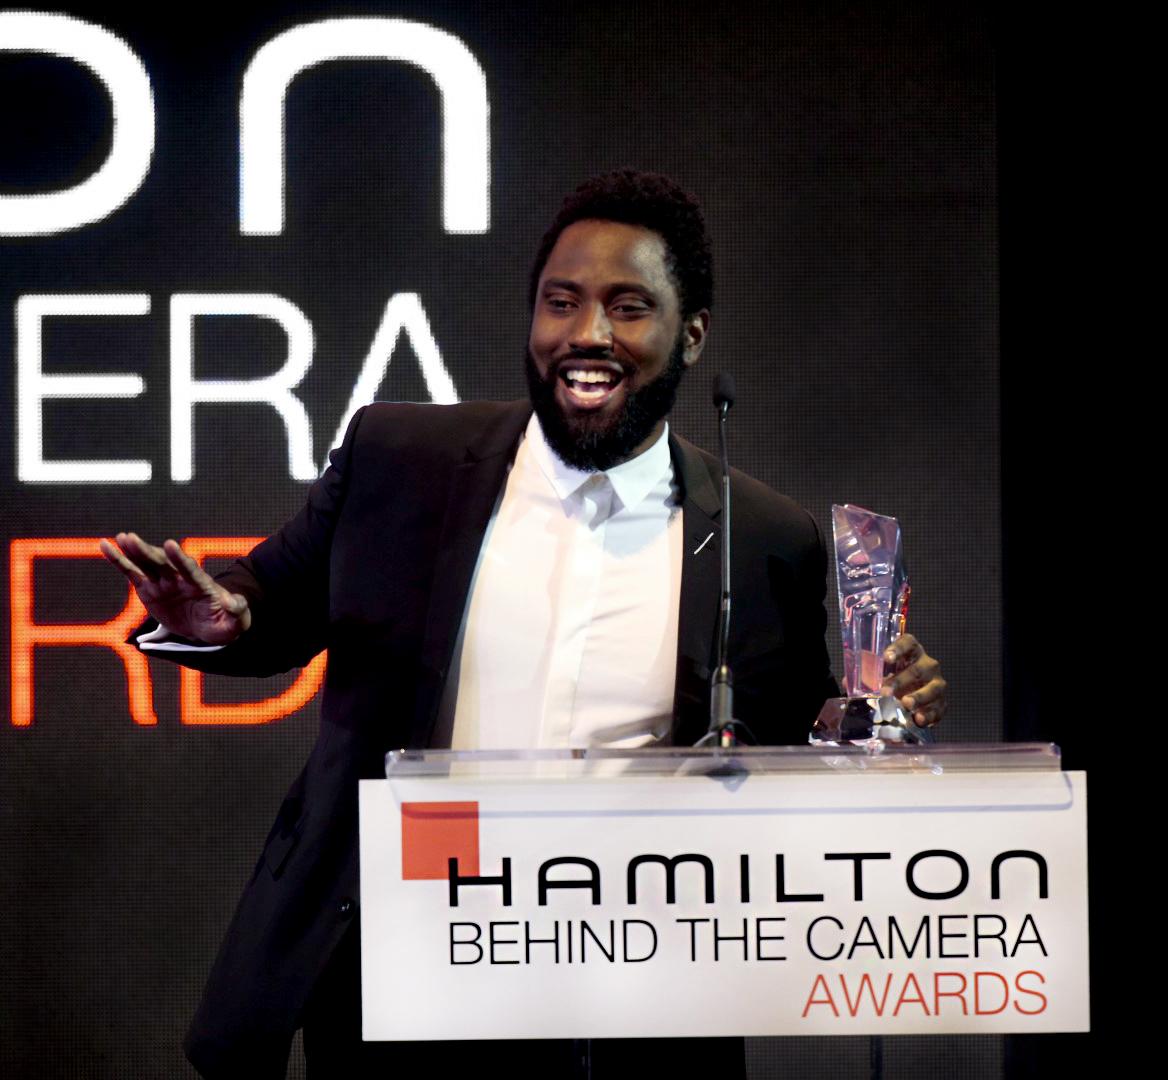 Hamilton Behind the Camera Awards 2018 - John David Washington - On stage.